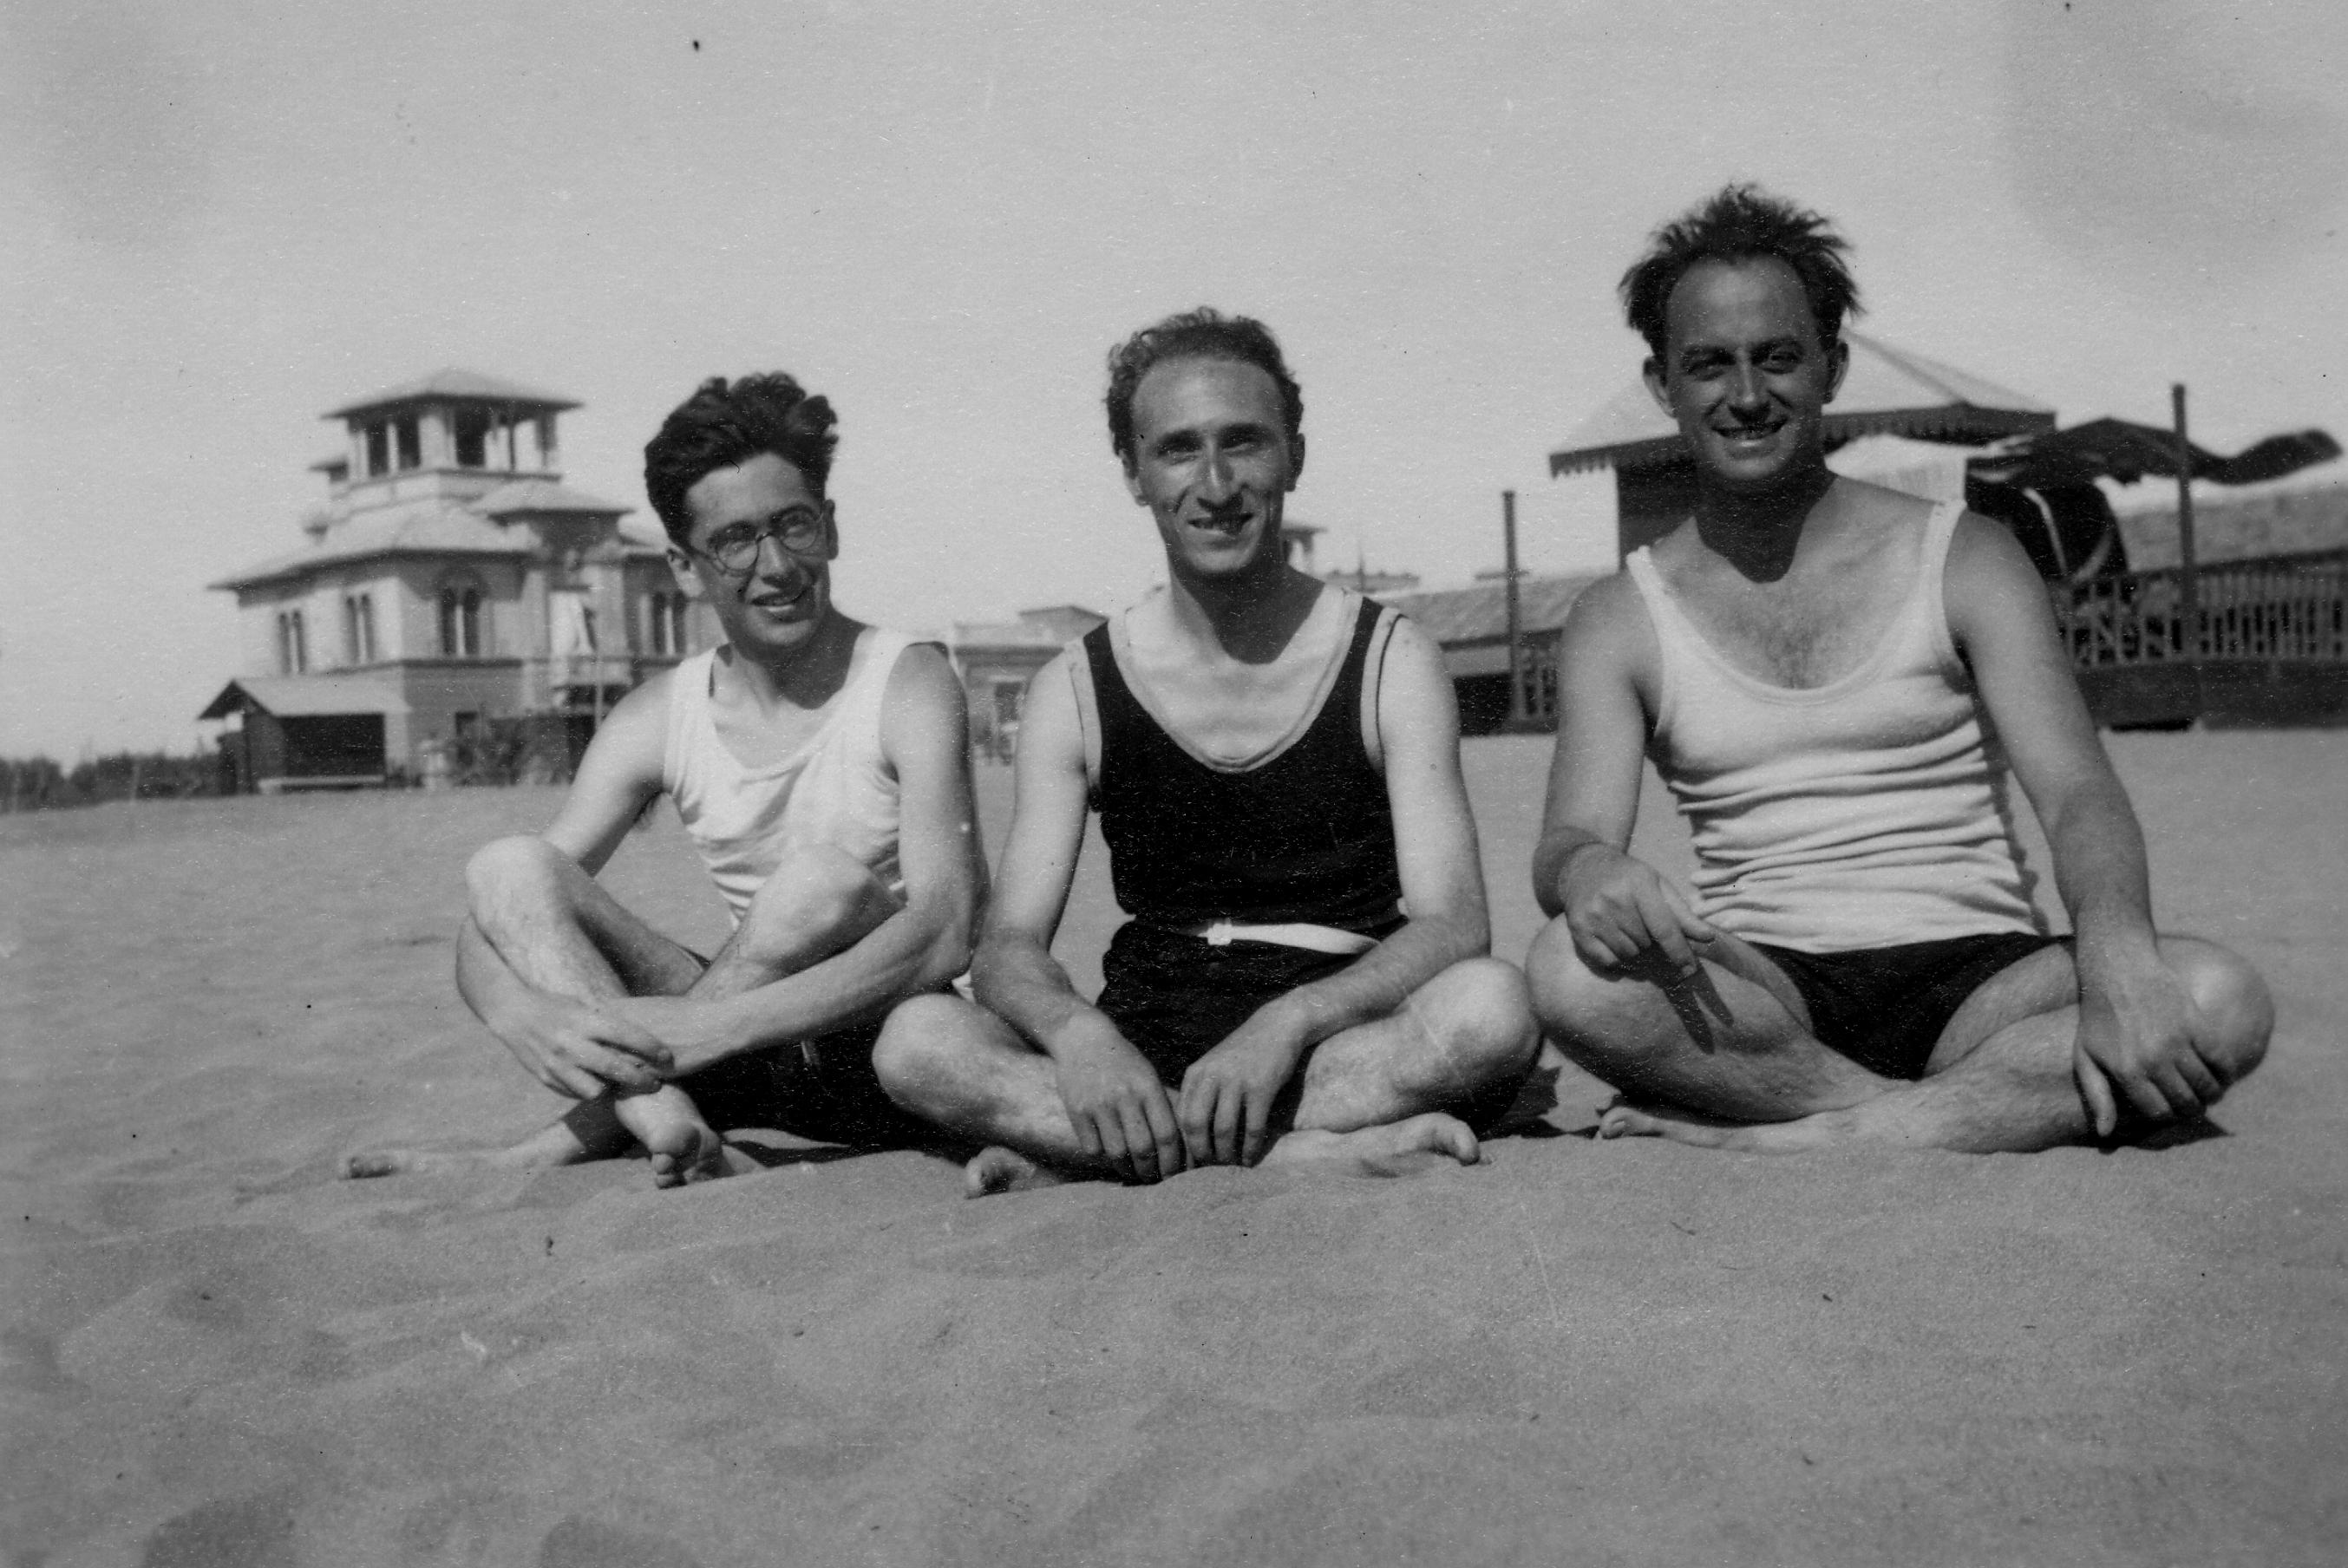 Emilio Segrè, Enrico Persico and Enrico Fermi sitting on beach